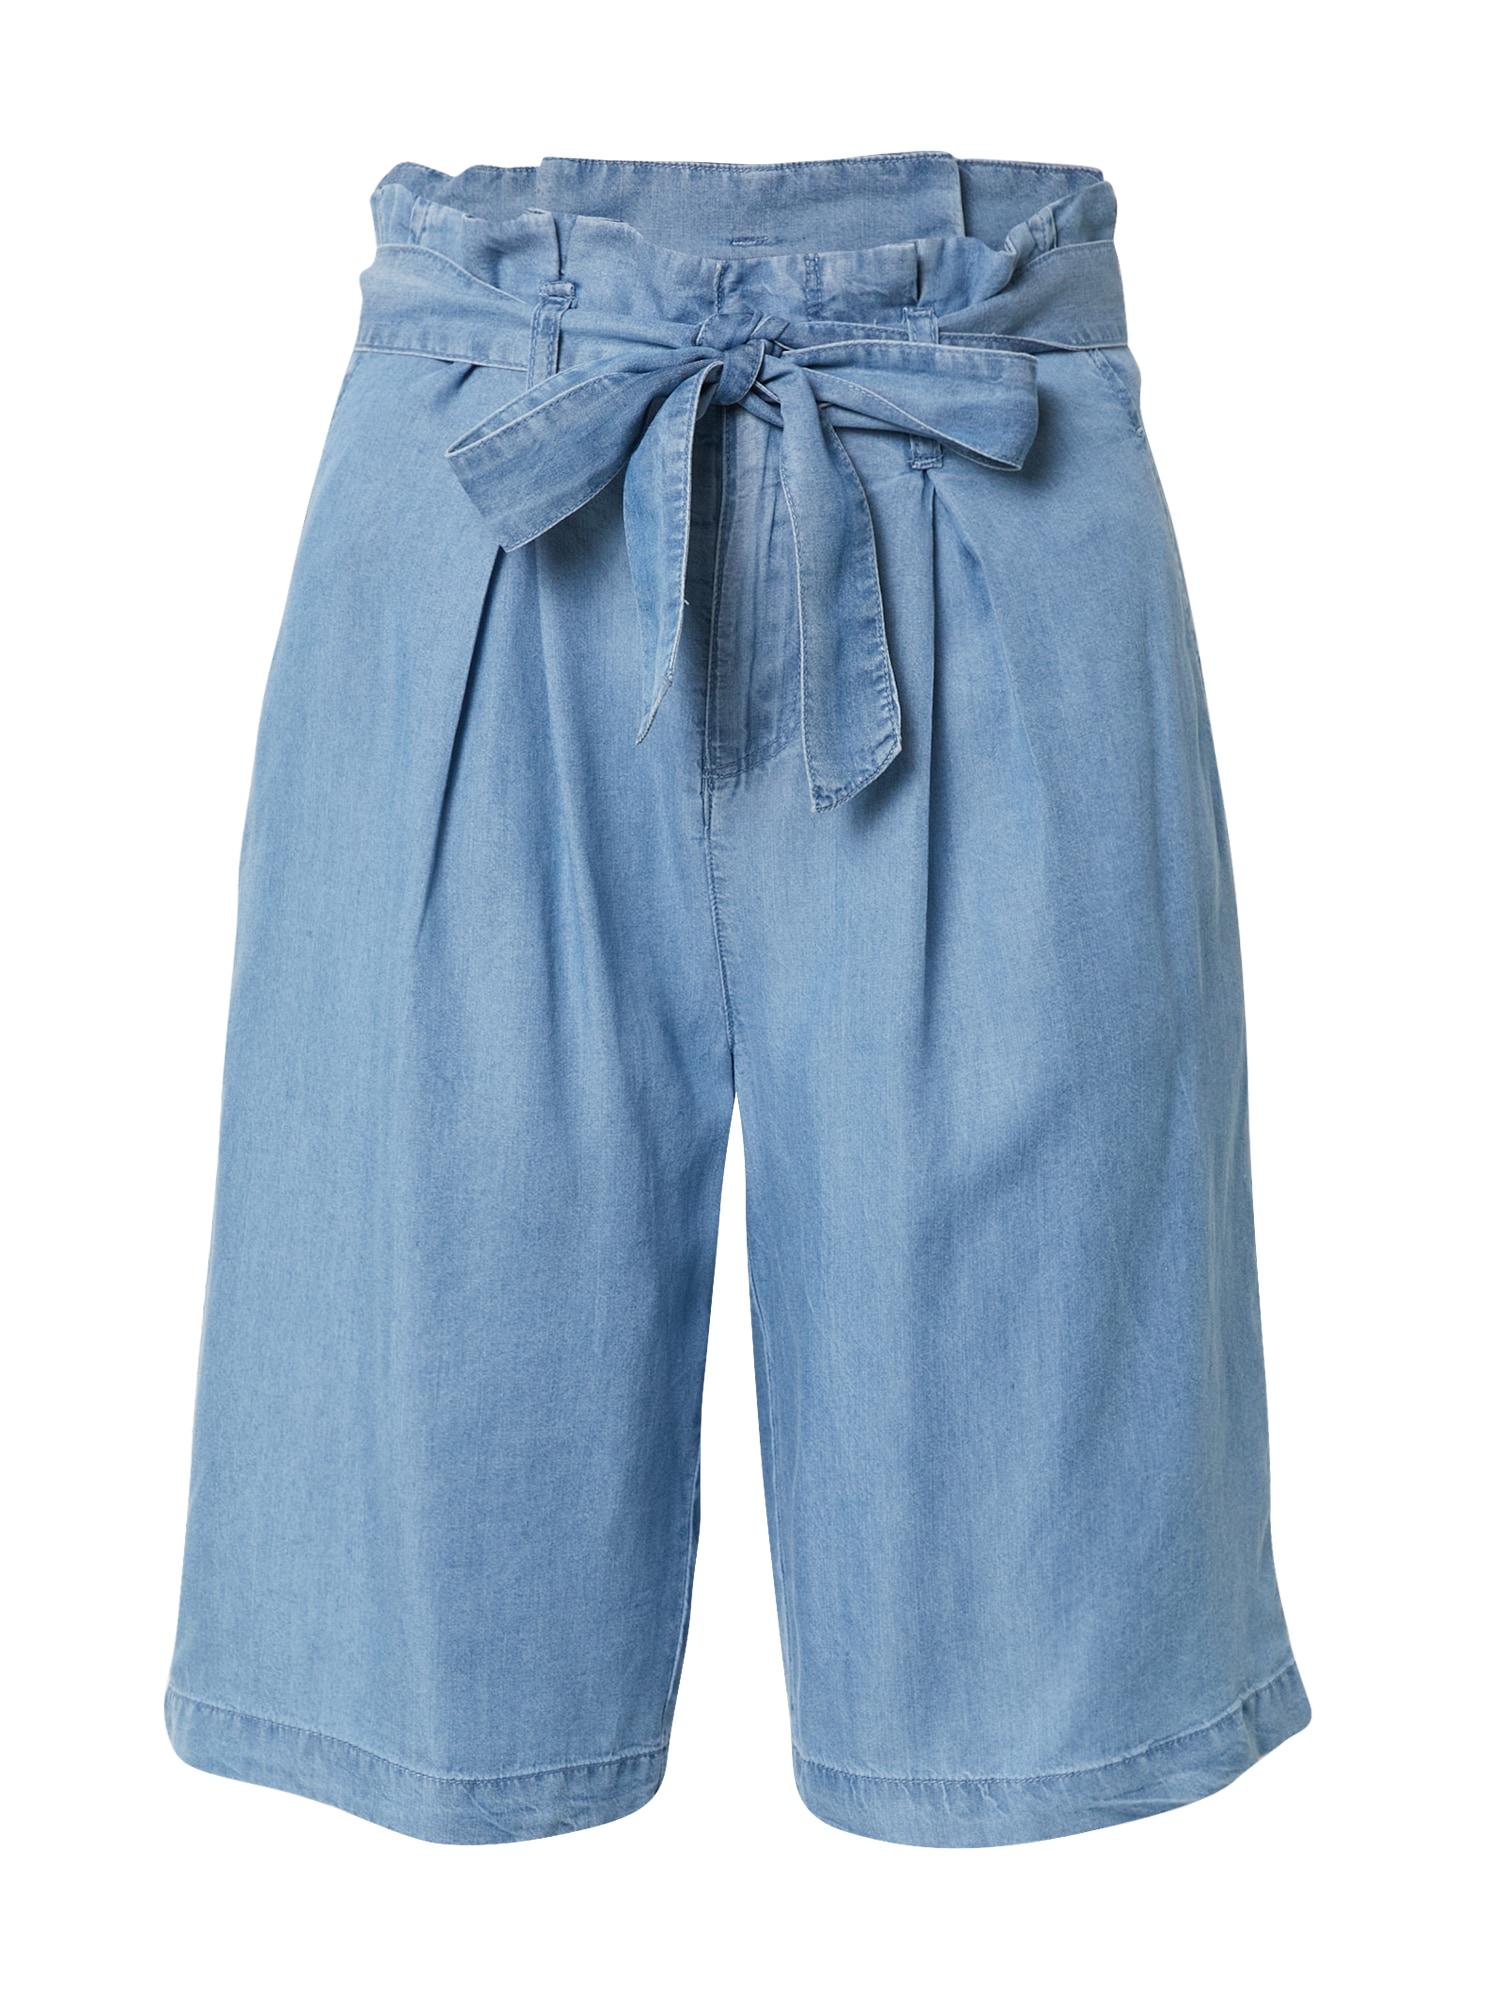 ONLY Džinsai su kantu 'EMMA' tamsiai (džinso) mėlyna